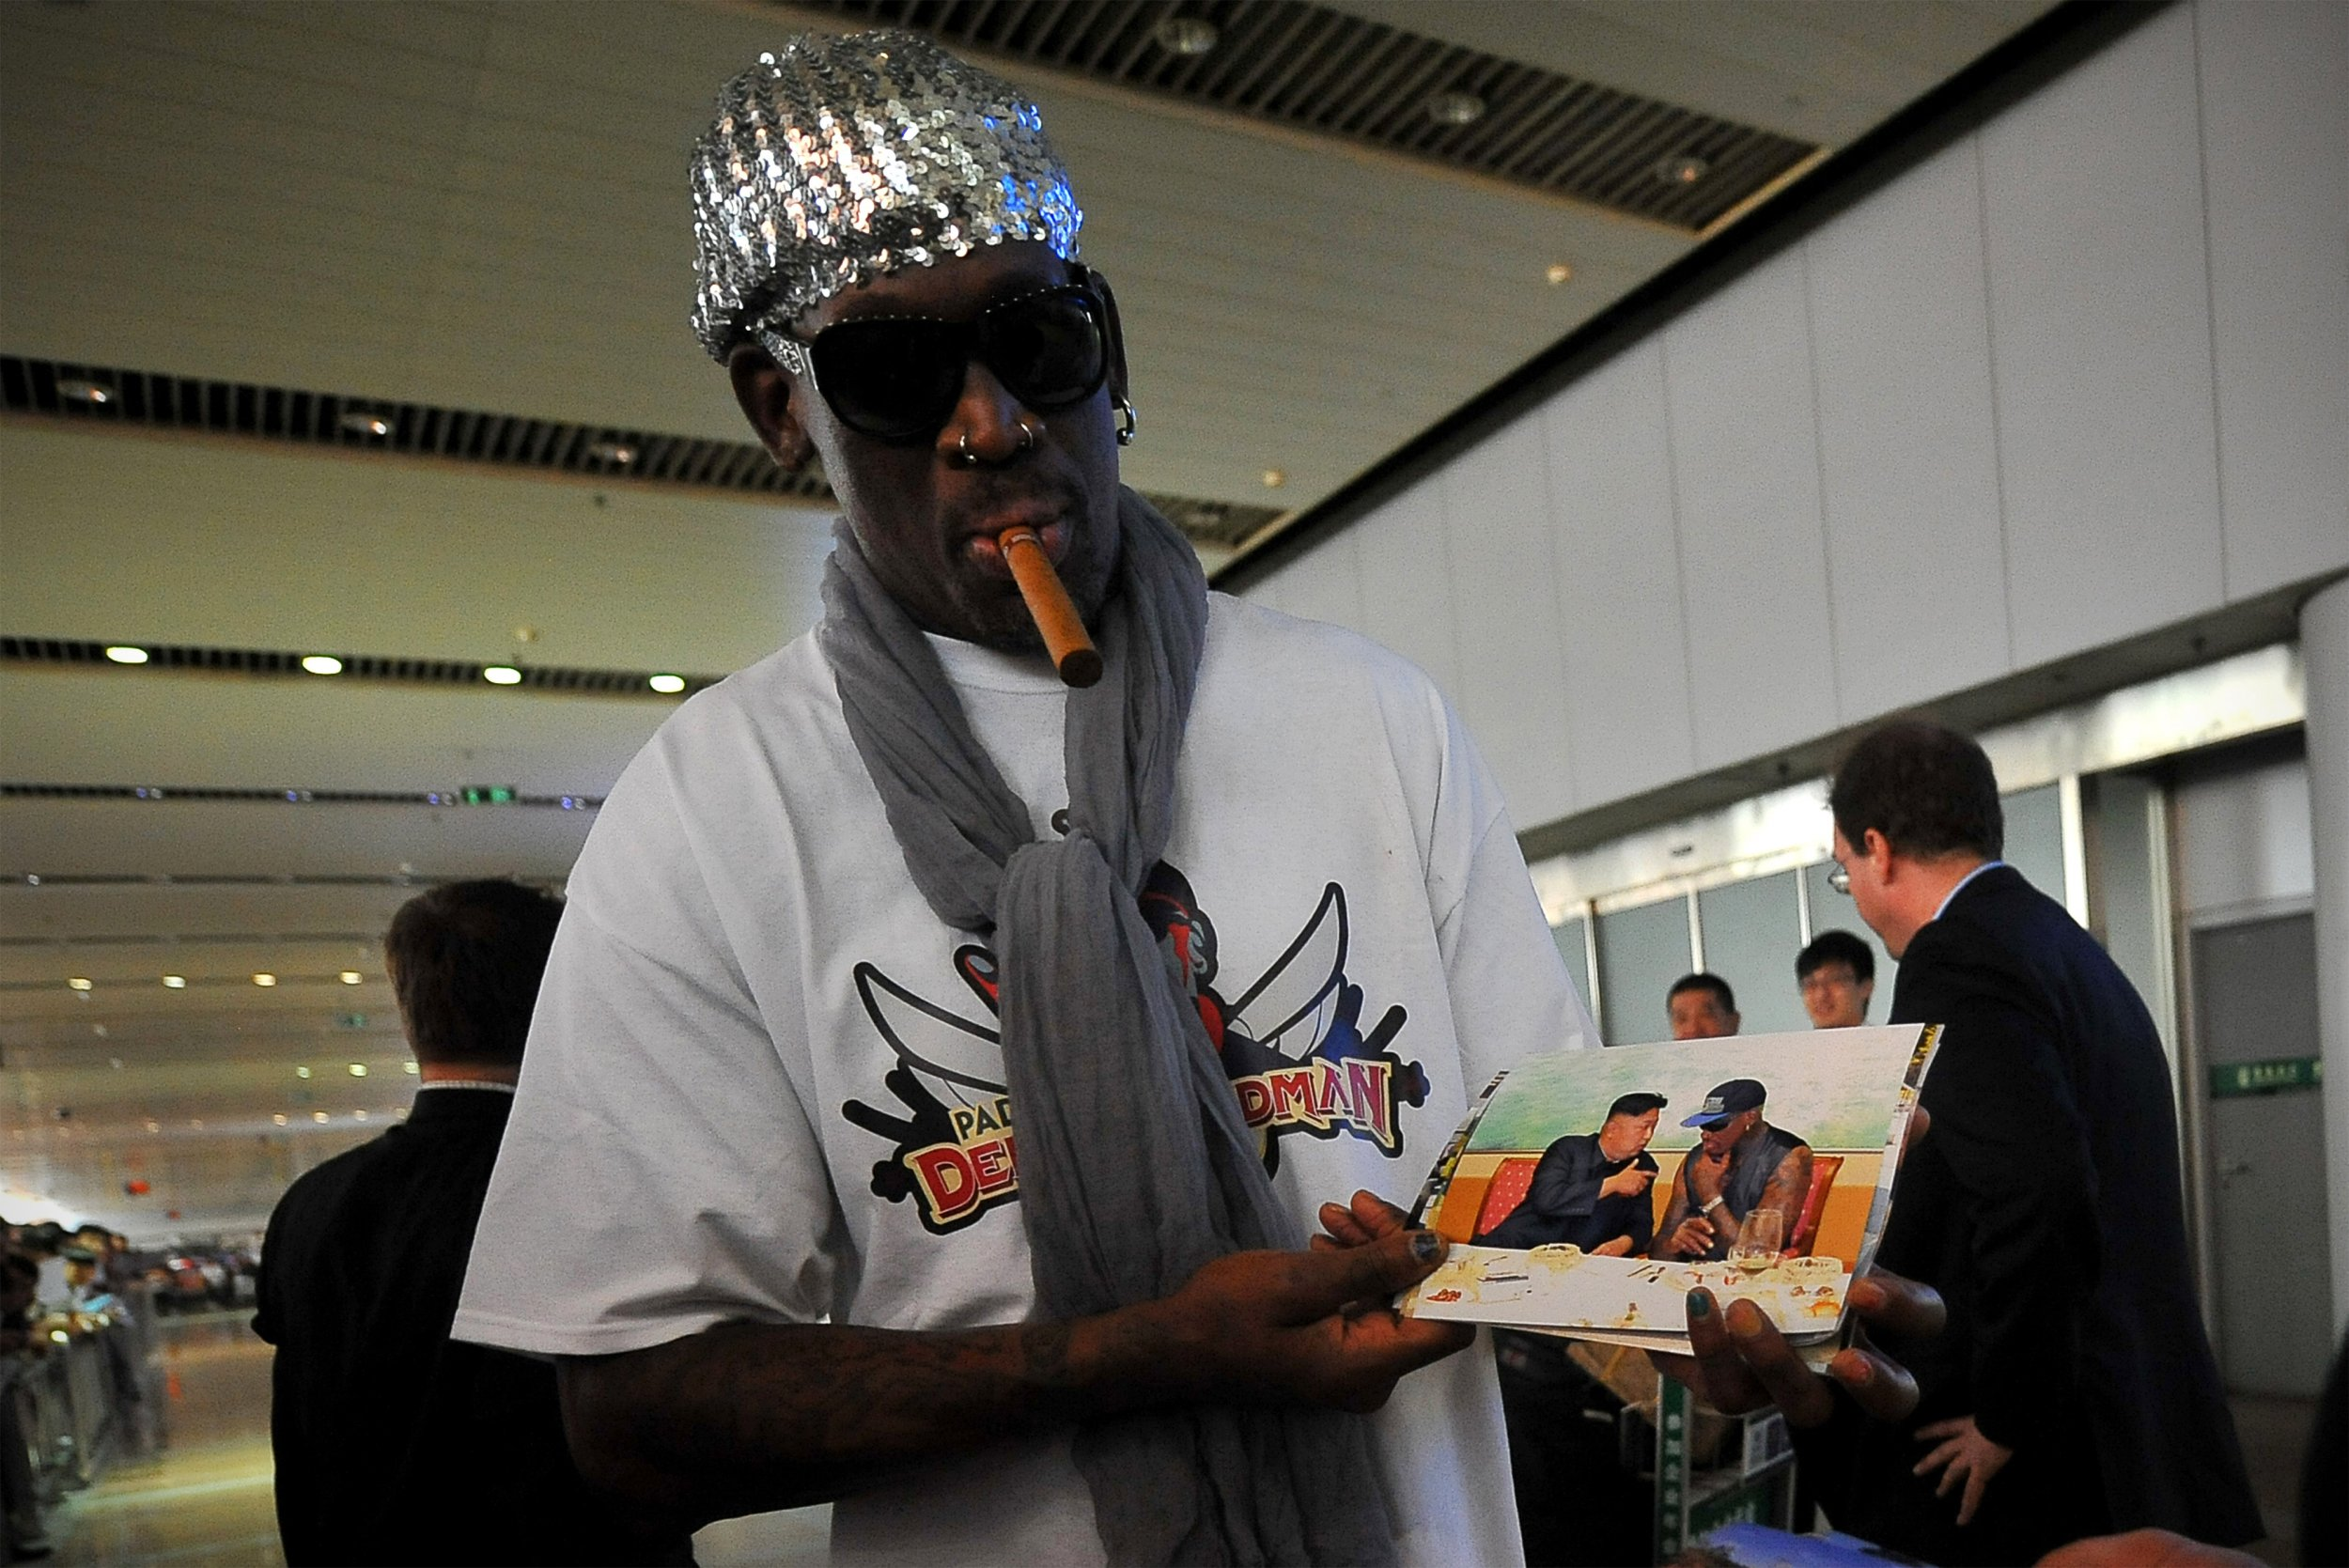 Former NBA star Dennis Rodman at Beijing International Airport, China, September 7 2013.